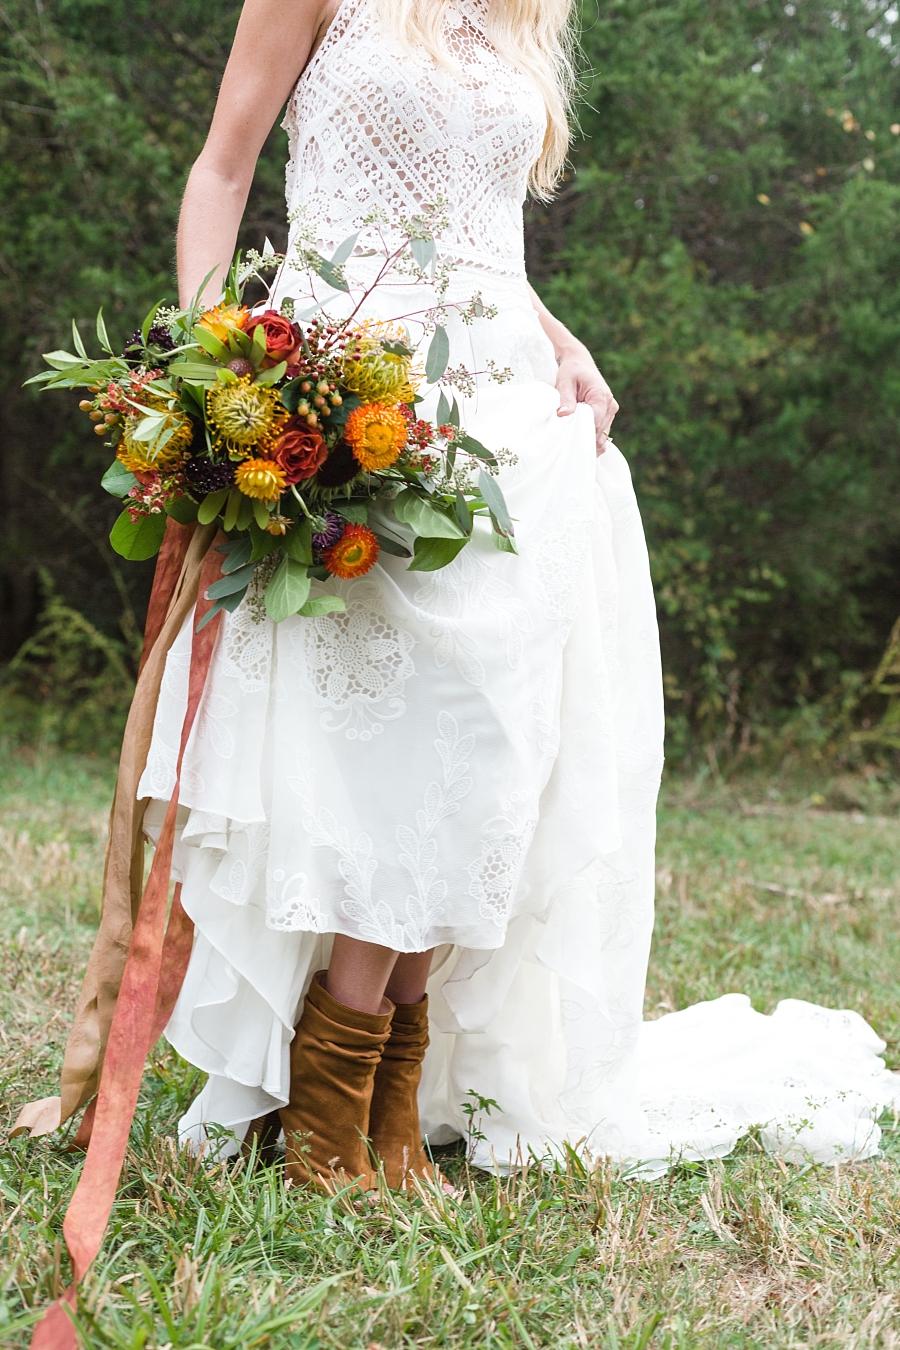 Stacy-Anderson-Photography-Cedarwood-Weddings-Nashville-Destination-Wedding-Photographer_0062.jpg